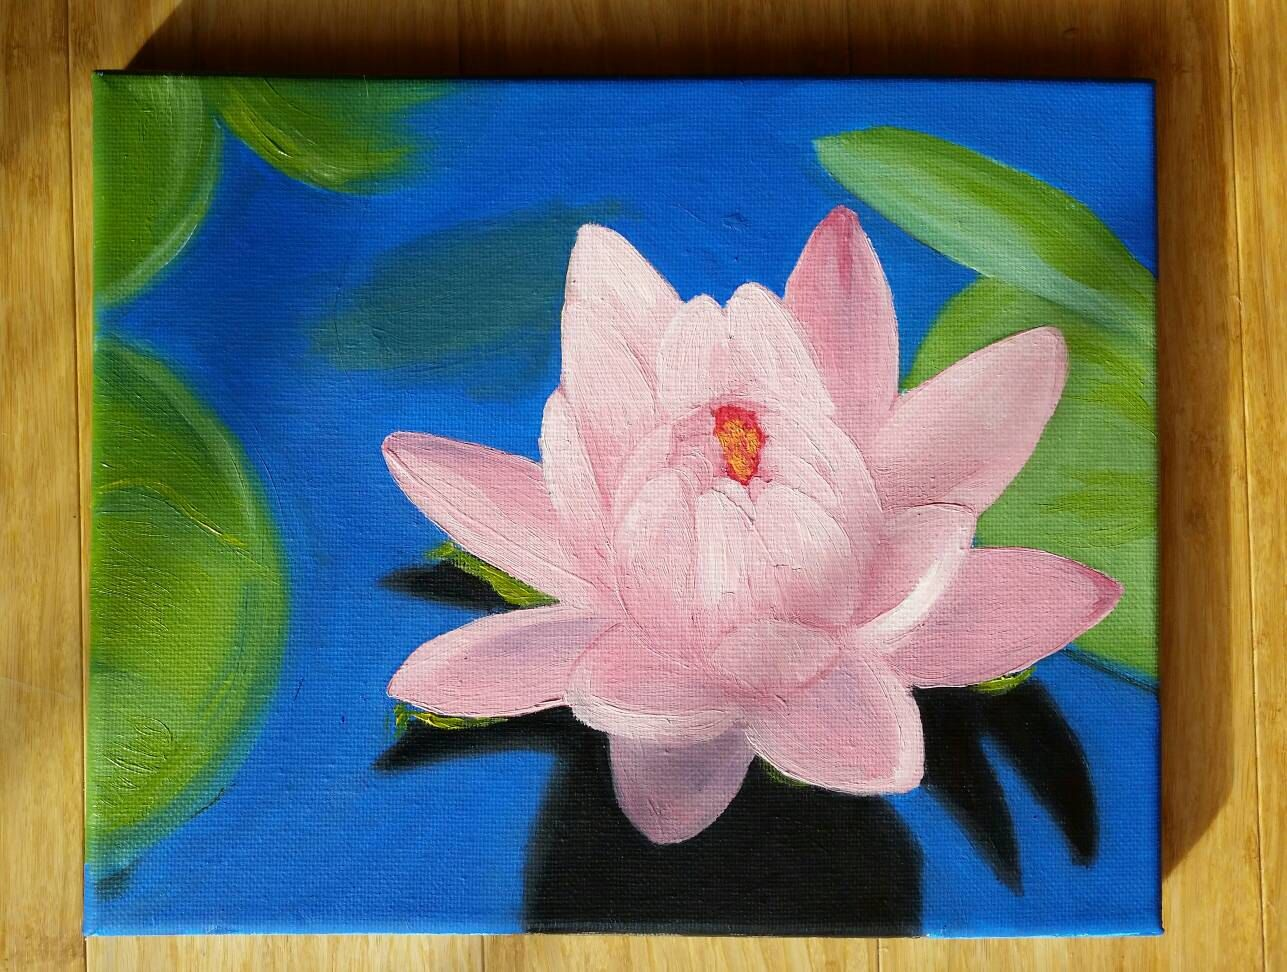 Oil painting lotus flower spring flower floral pink original artwork oil painting lotus flower spring flower floral pink original artwork by couturepapillon on etsy on izmirmasajfo